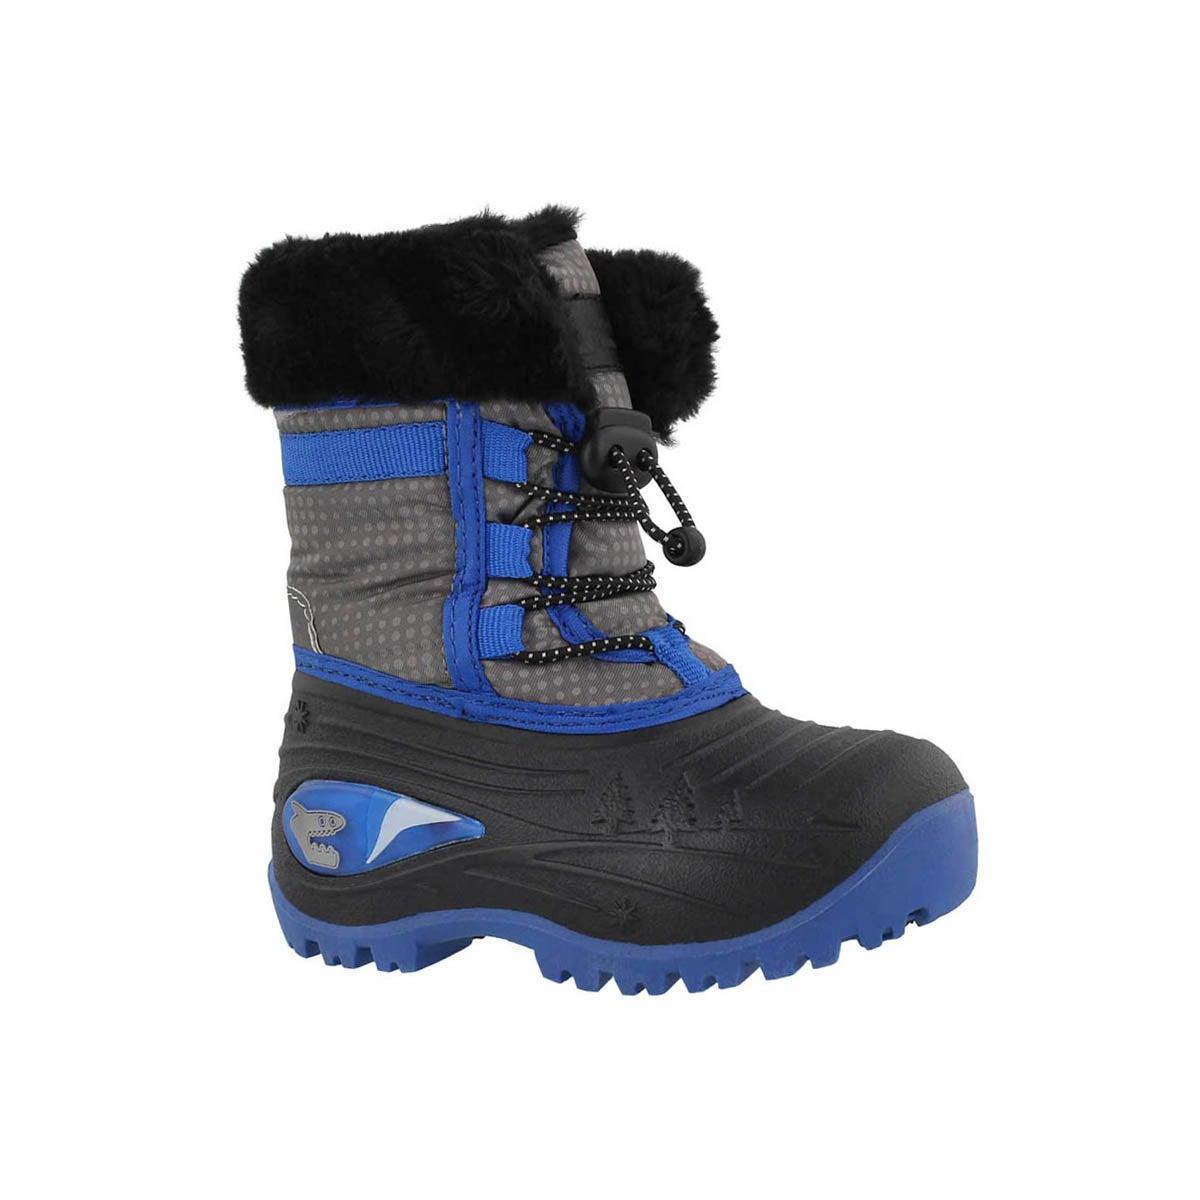 Infants' BLAZE blue wtpr light up winter boots